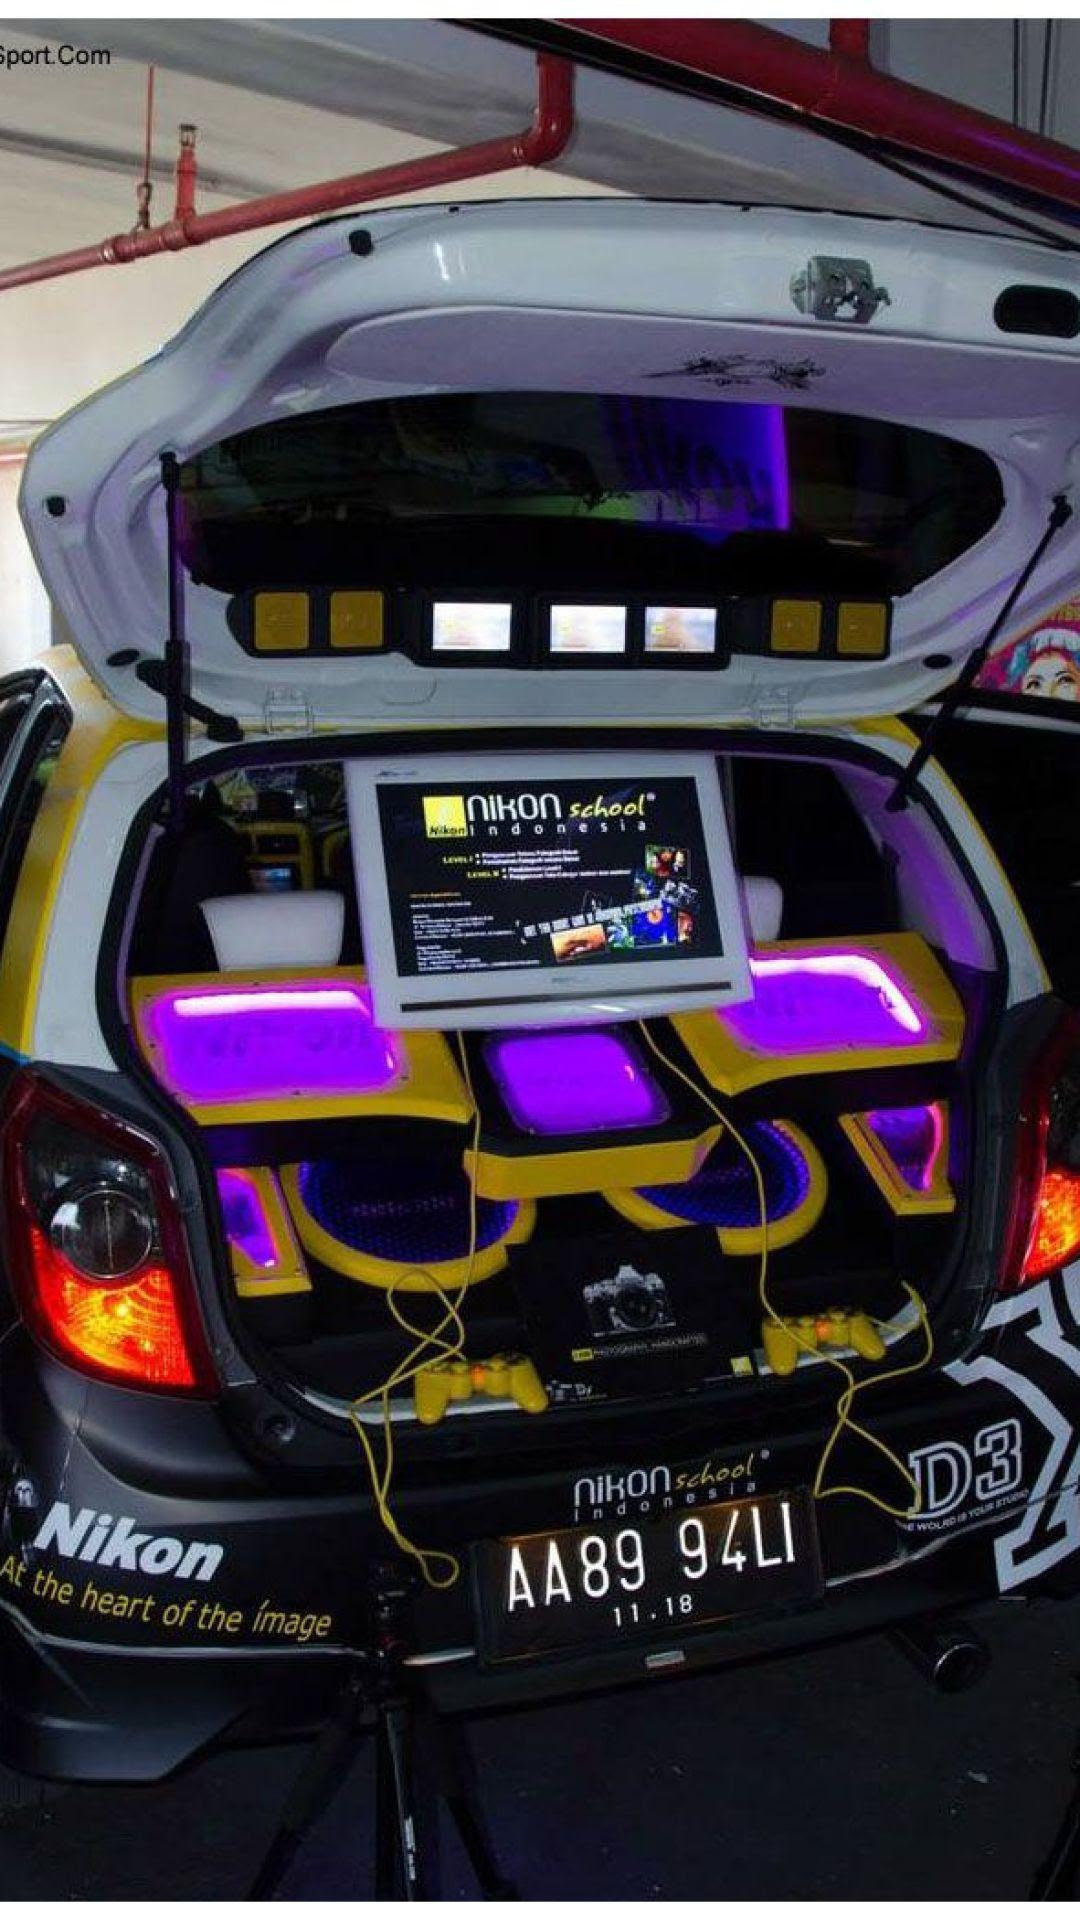 Kumpulan Modifikasi Audio Mobil Agya Terbaru Rekanotomotif